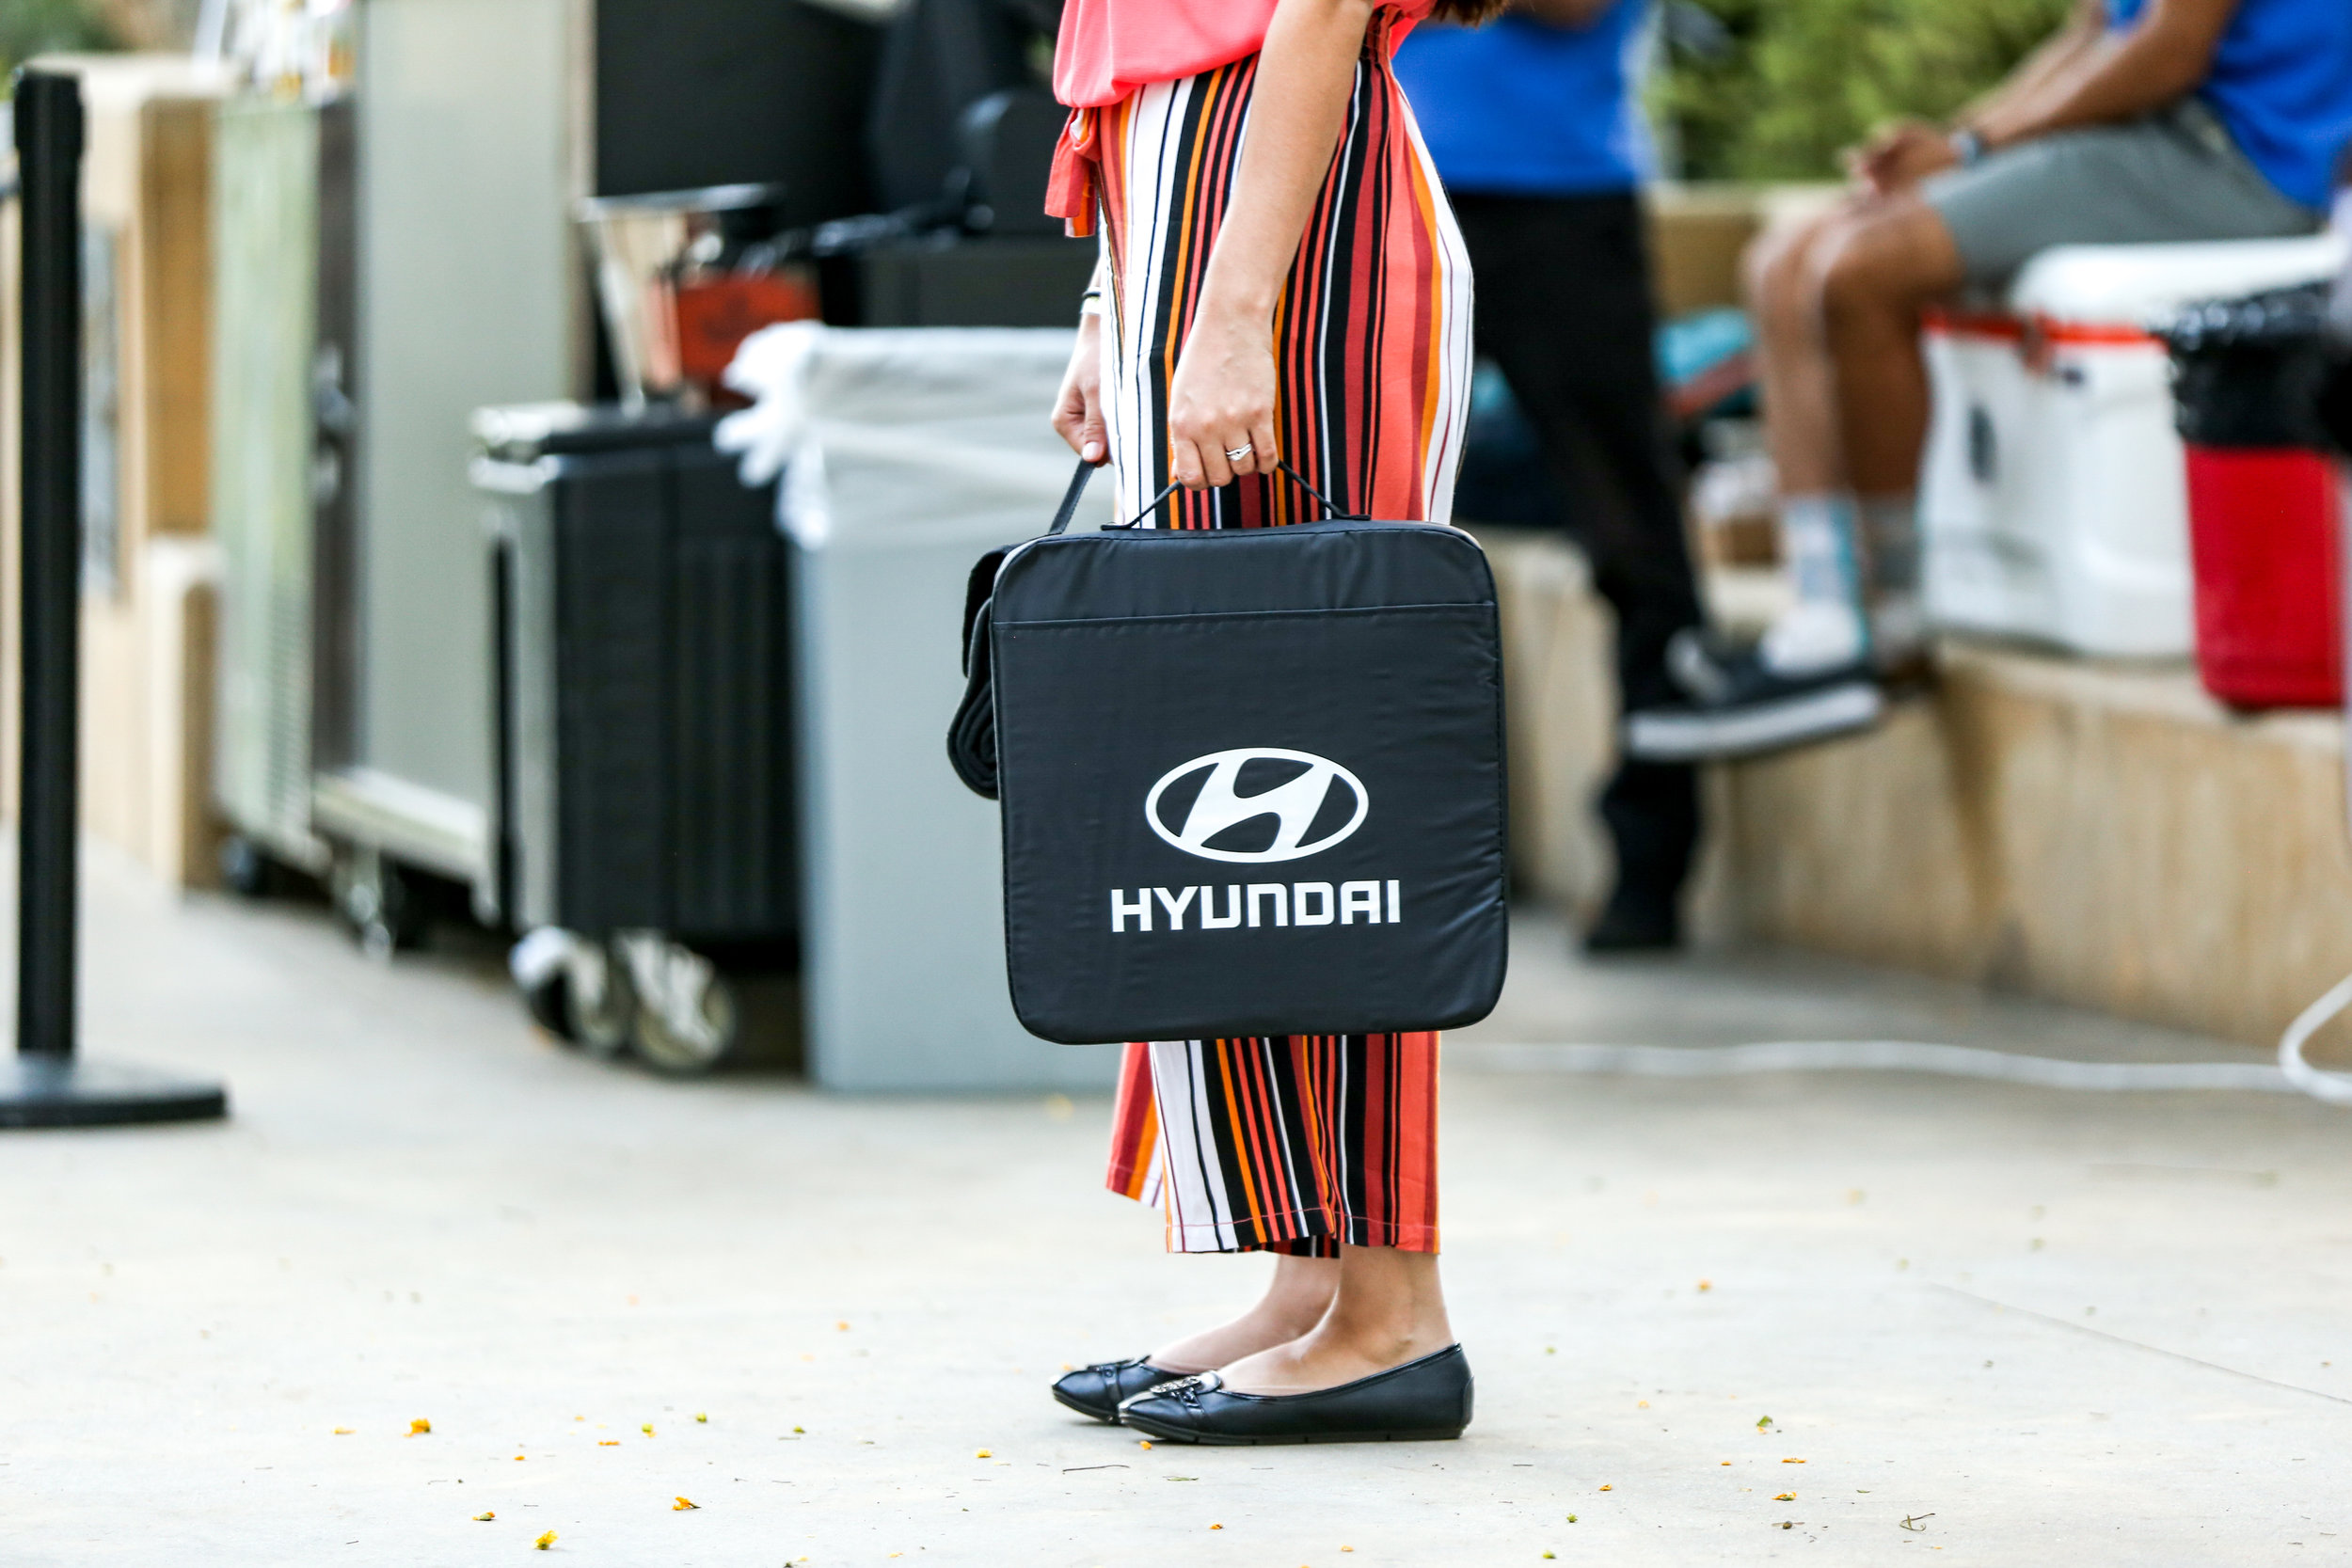 OHelloMedia-Hyundai-Outfest-LA-TopSelect-2887.jpg